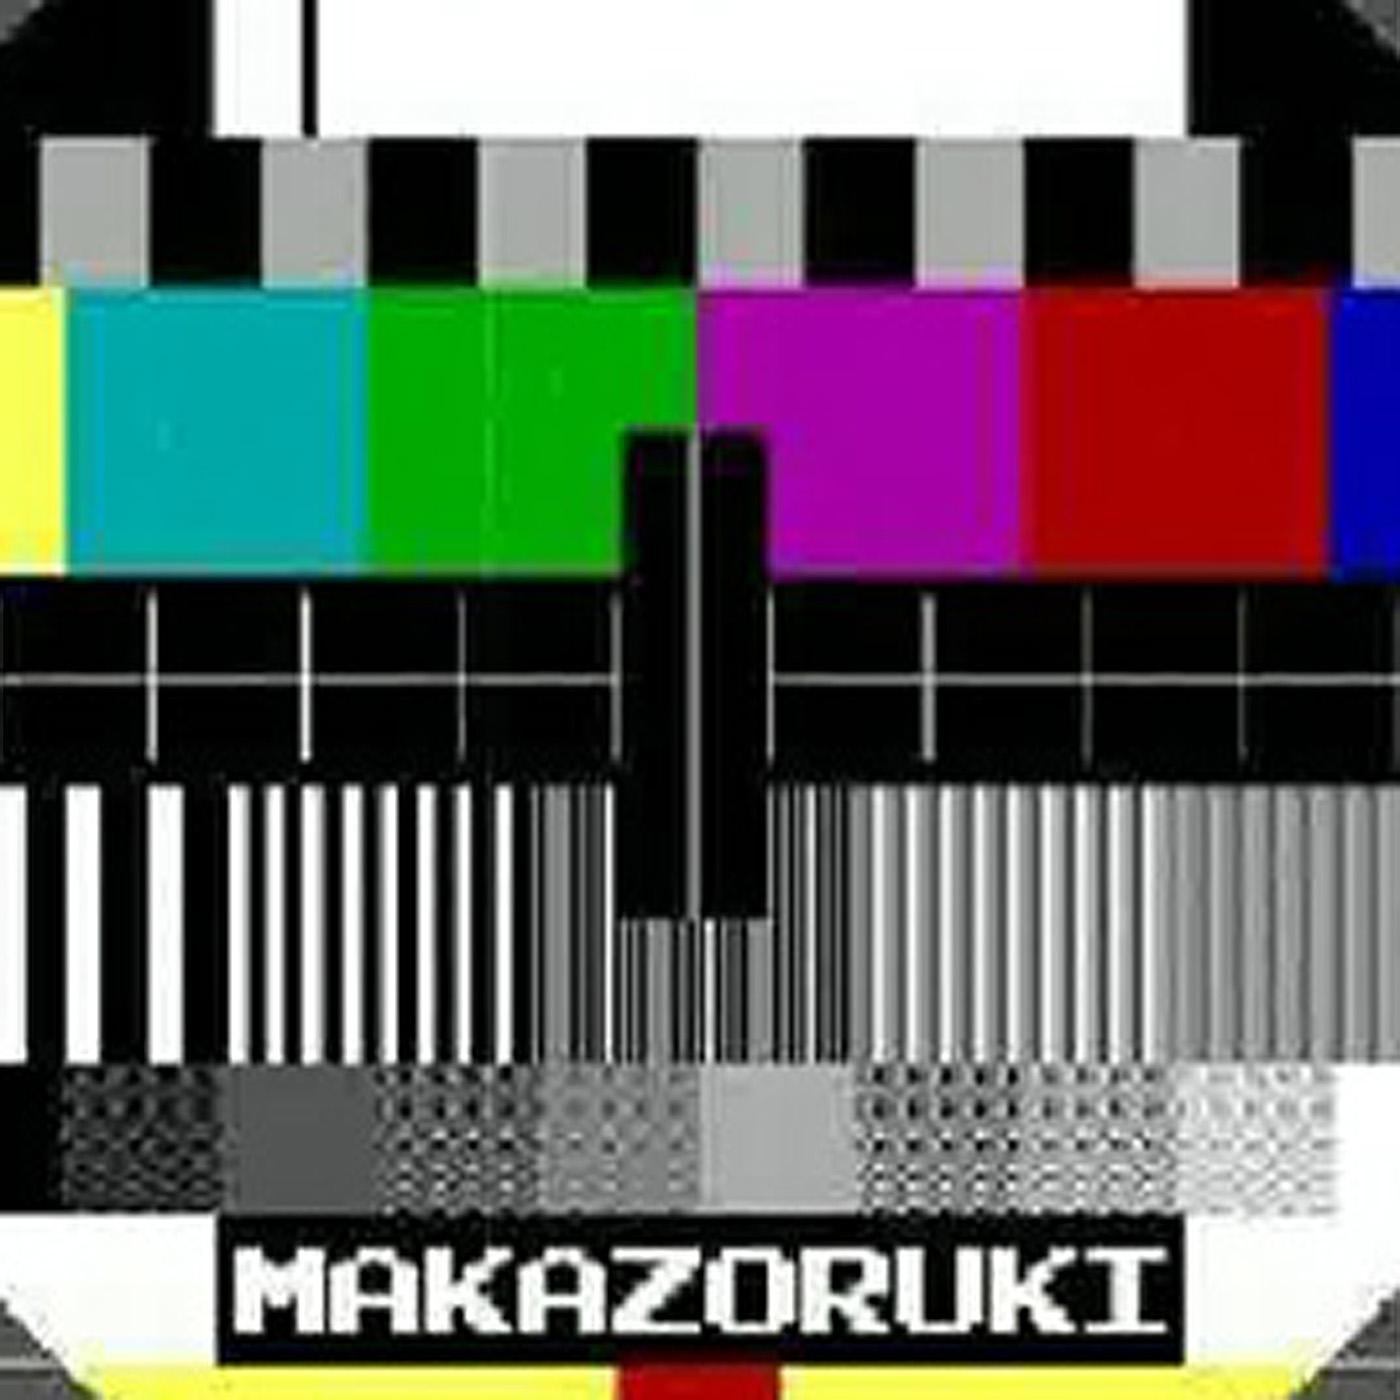 NM016a: makazoruki - fire friend / shadows from the past